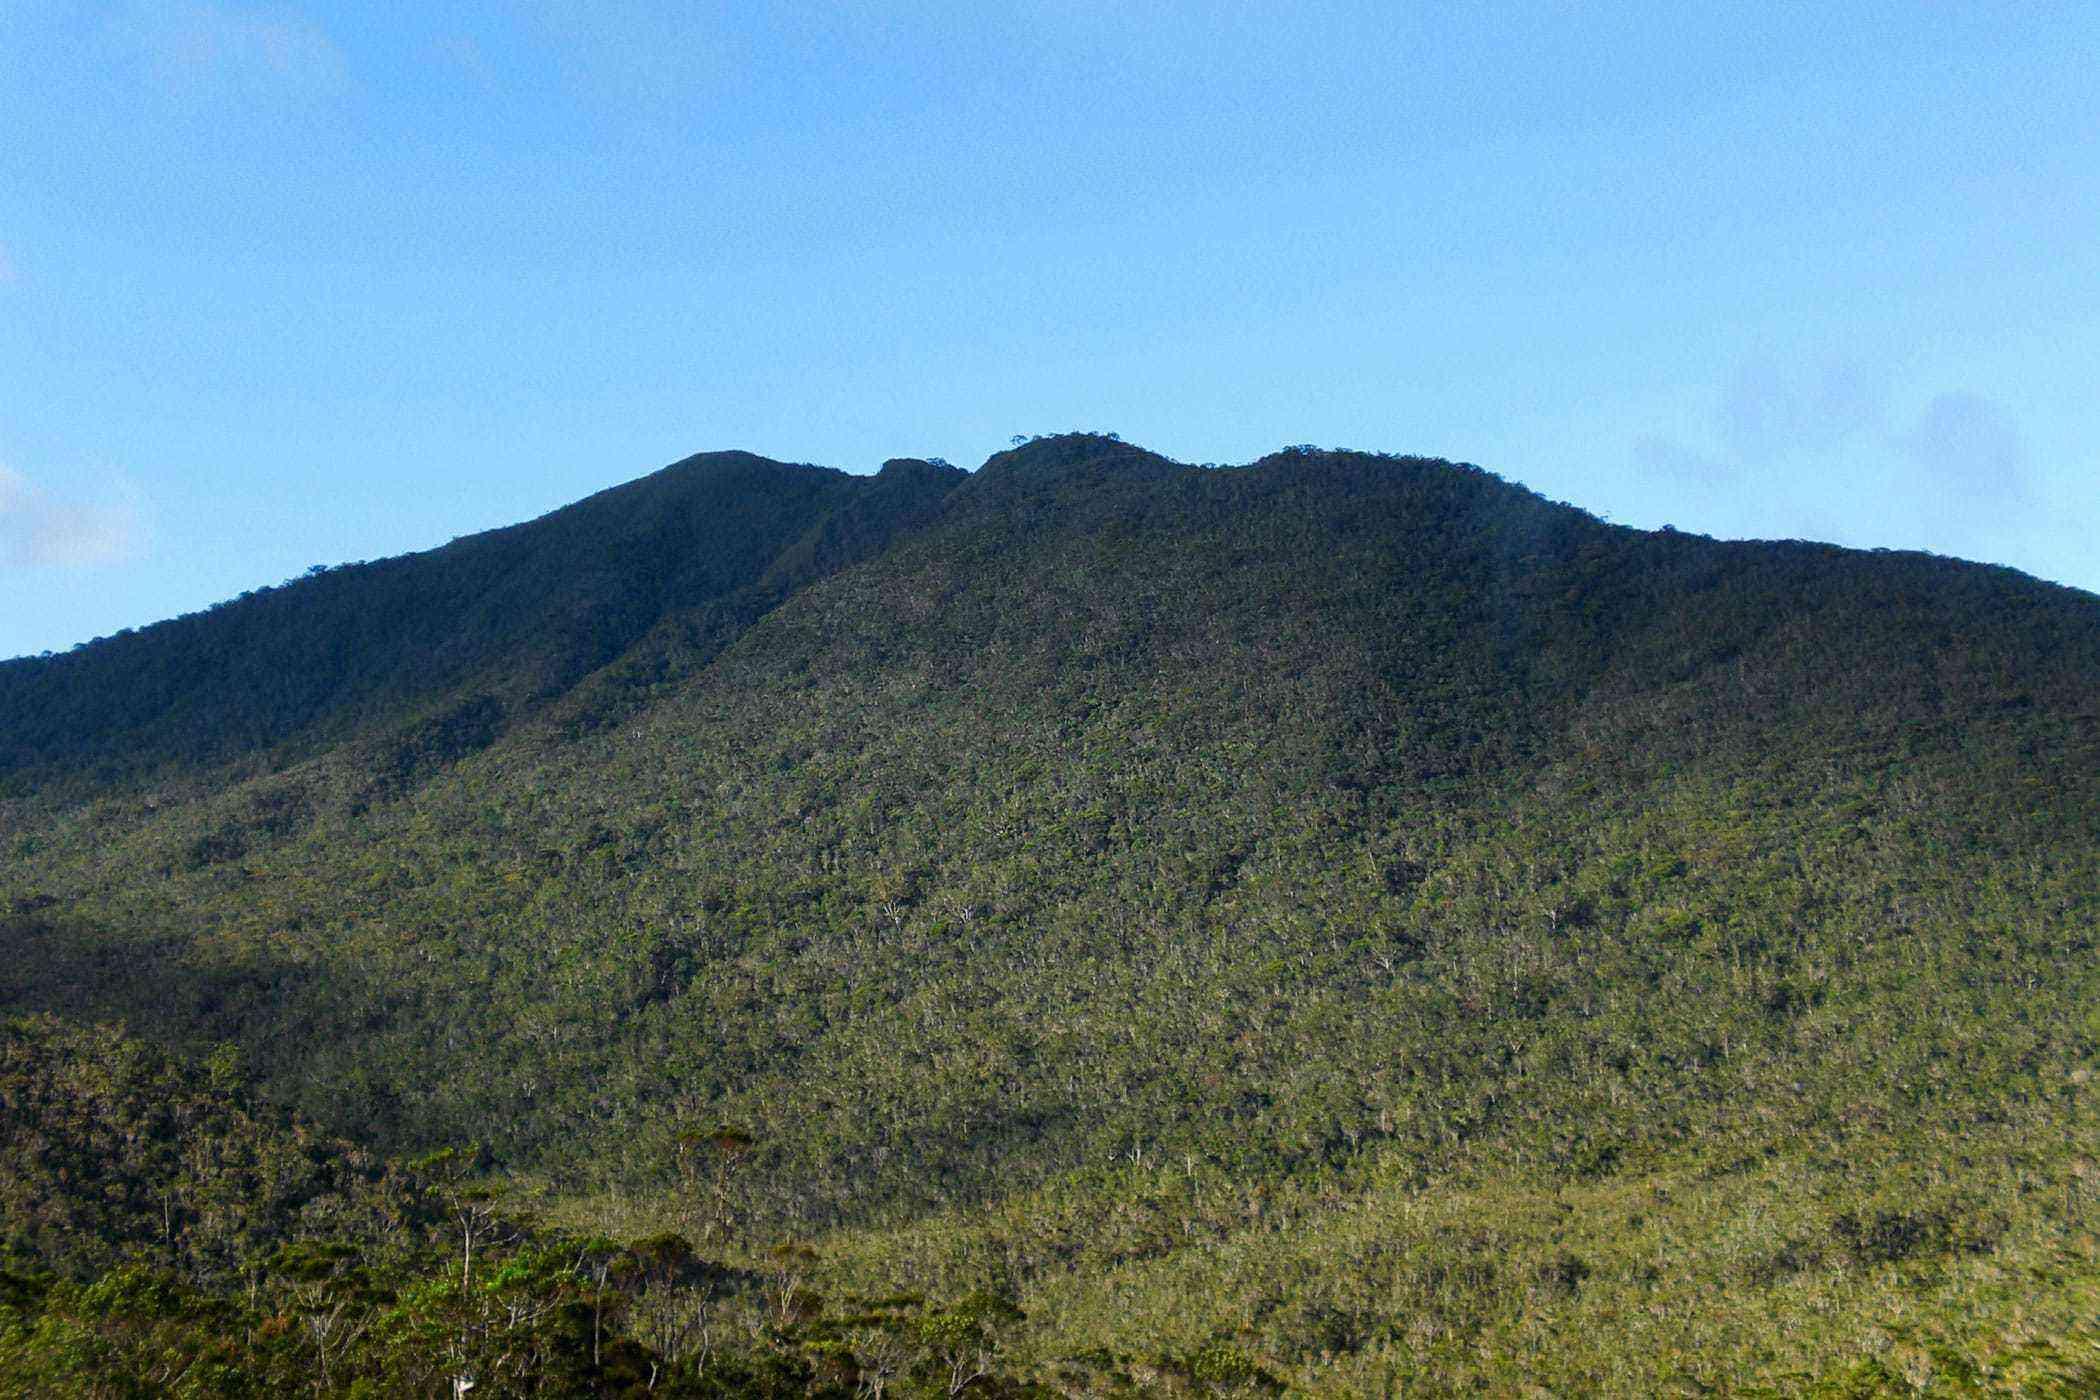 Mount Hamiguitan peak, Davao Oriental